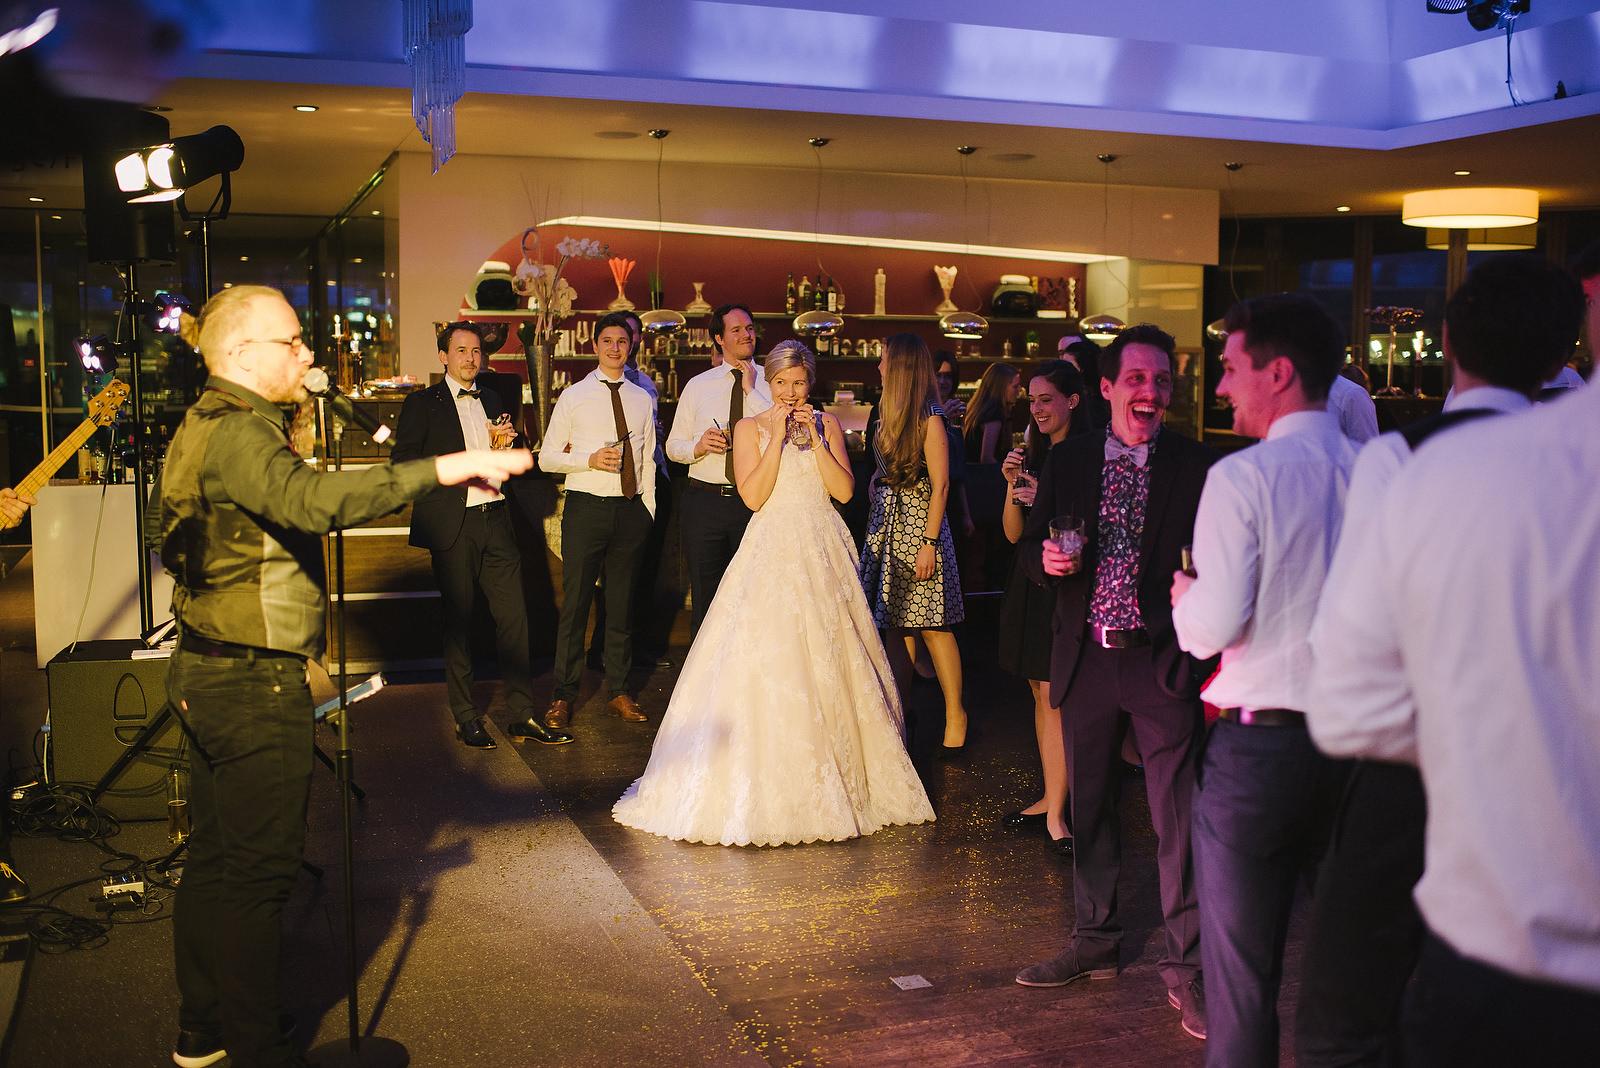 Fotograf Konstanz - Silvester Wedding in Hagnau / Friedrichshafen at Lake of Constance  - 53 -